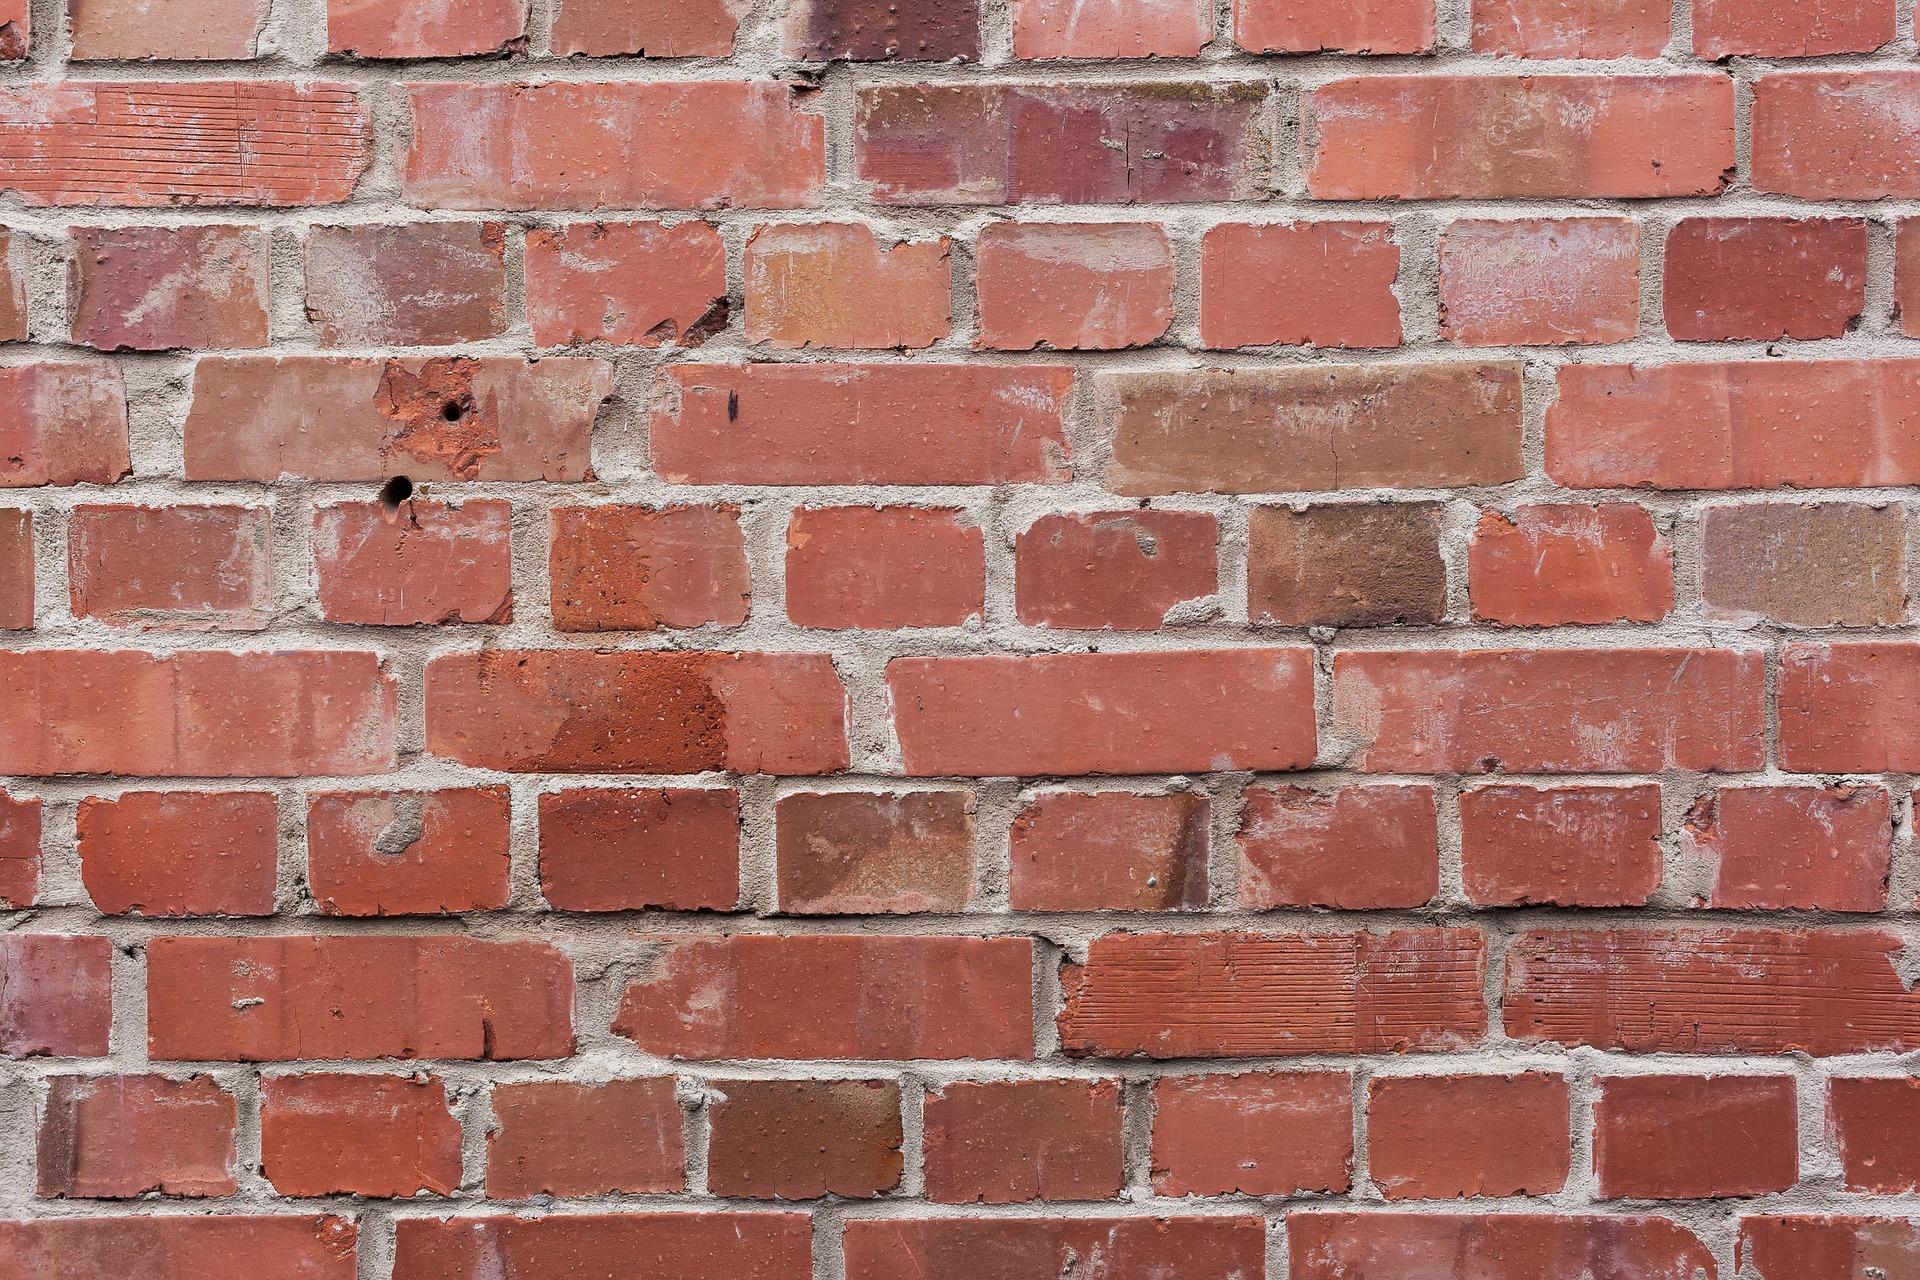 brick-1175224_1920.jpg